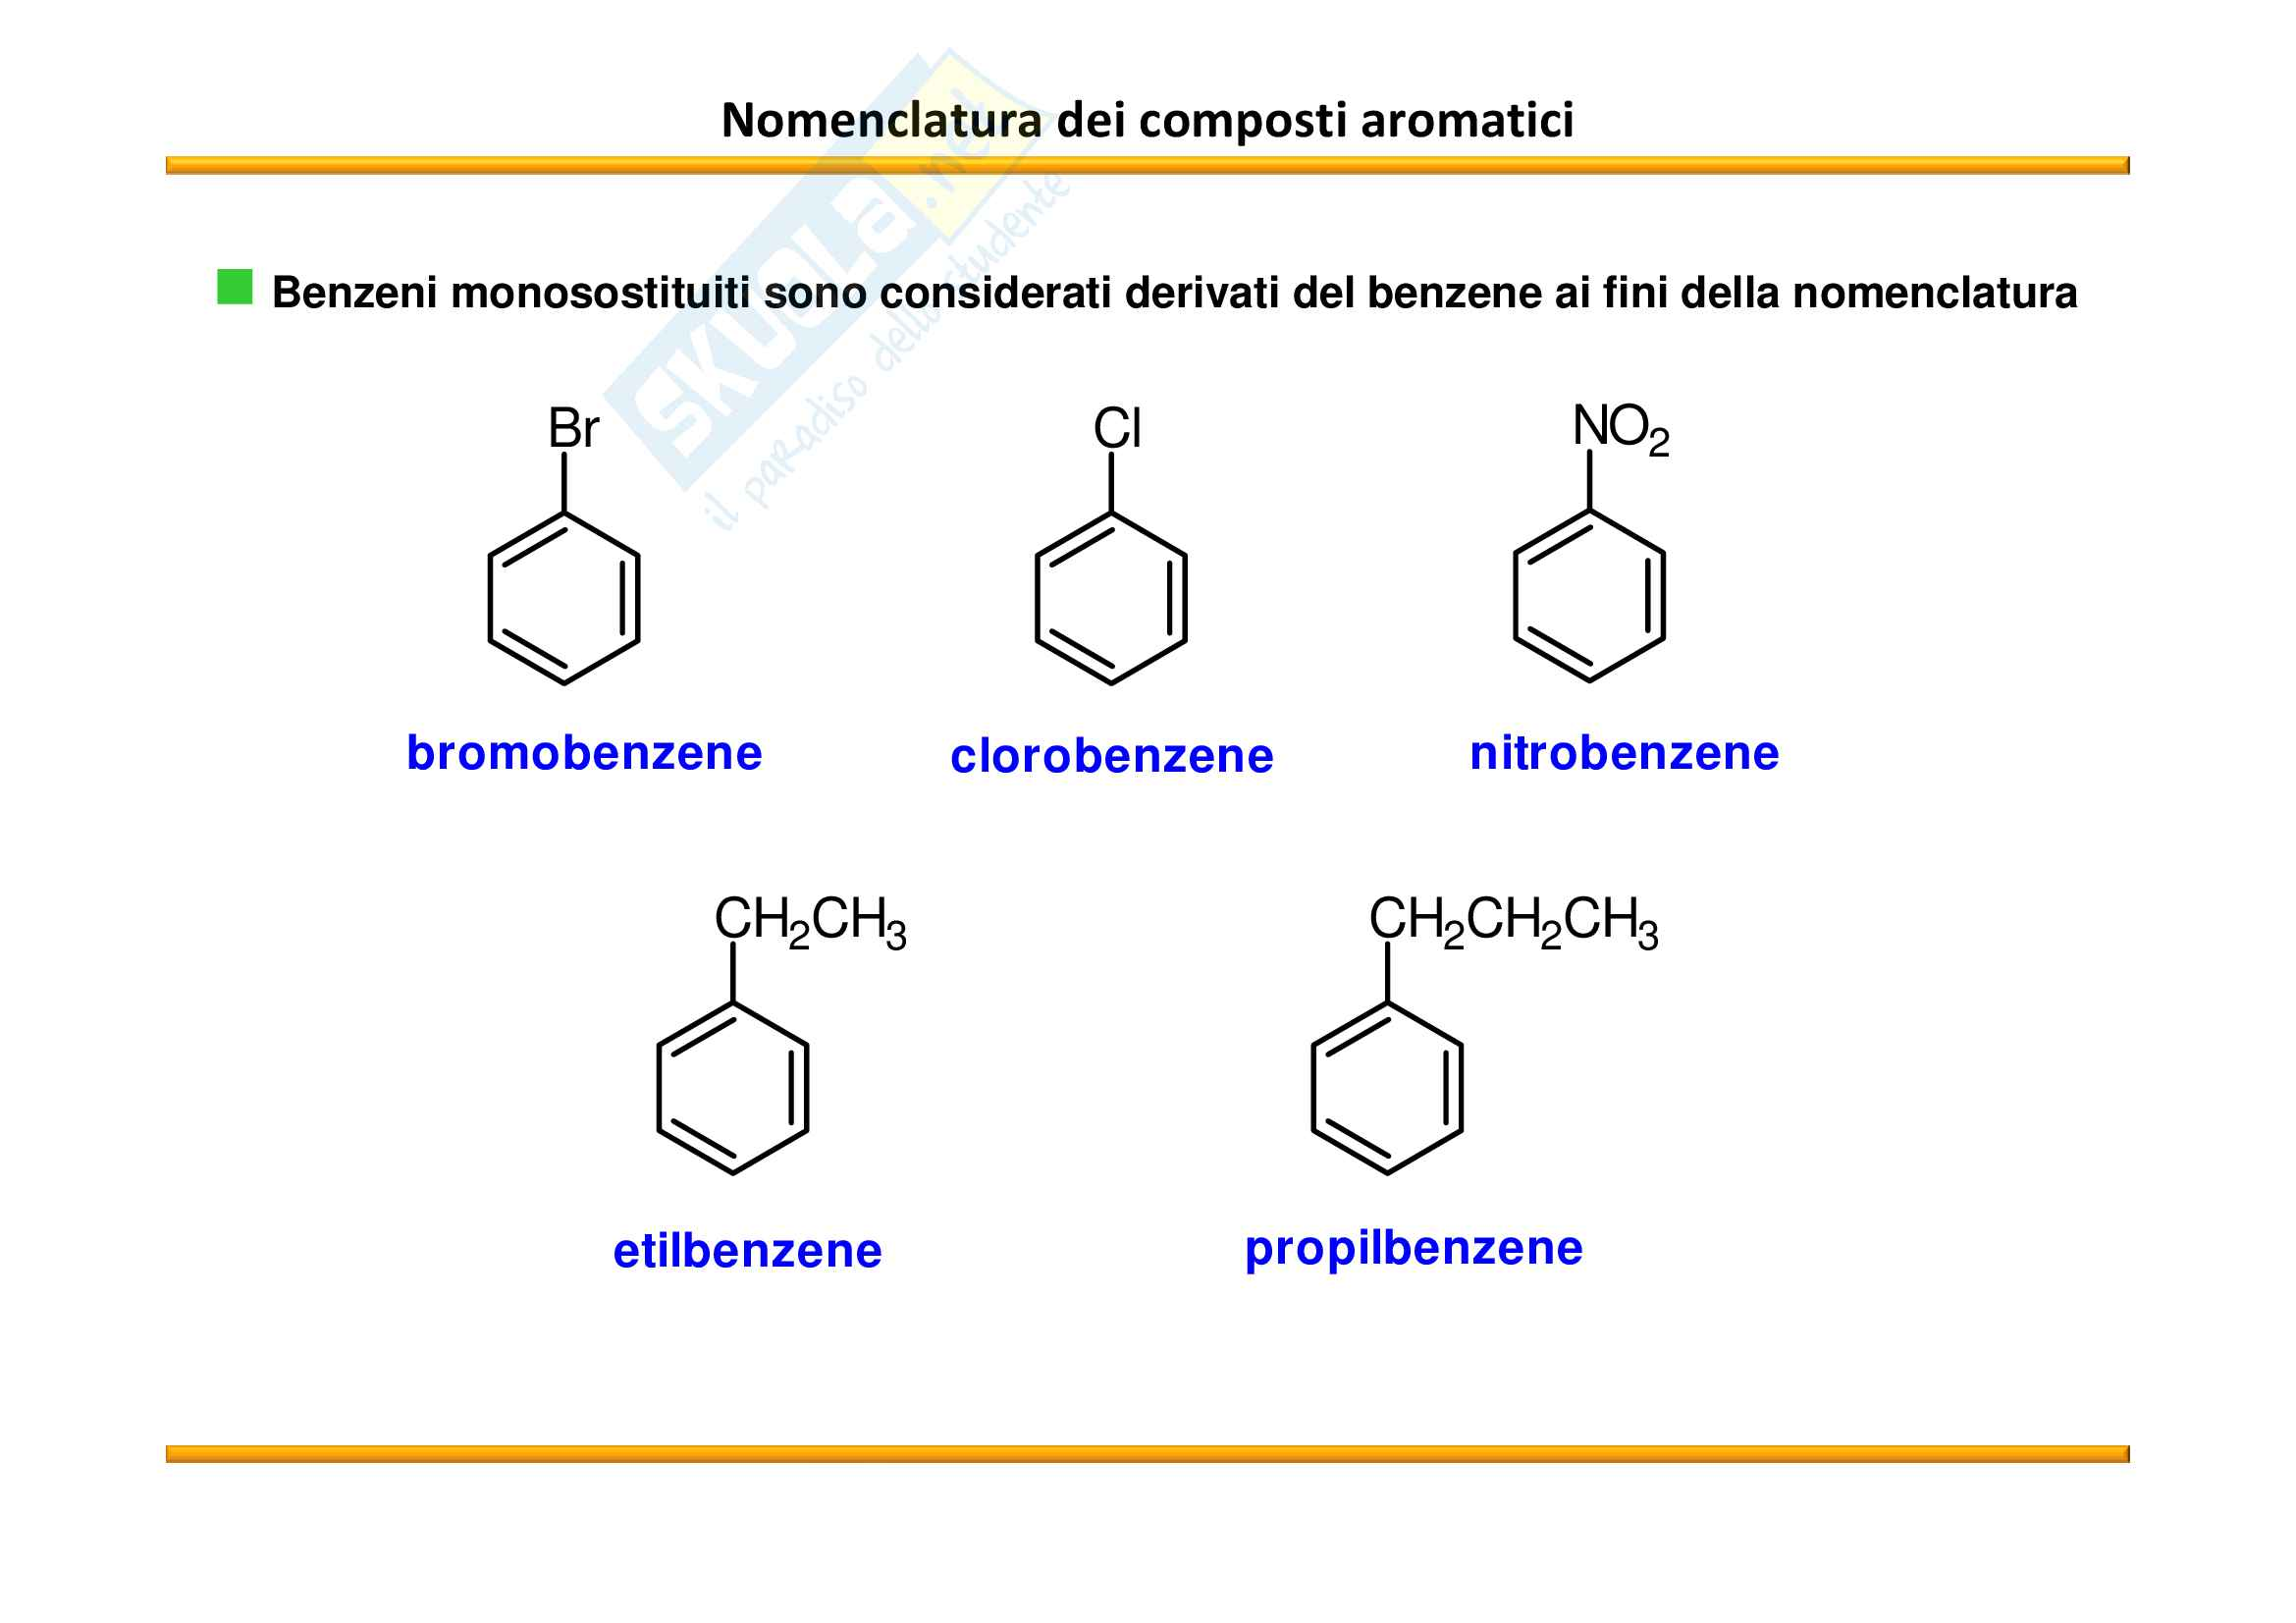 Chimica Organica: Composti aromatici Pag. 21